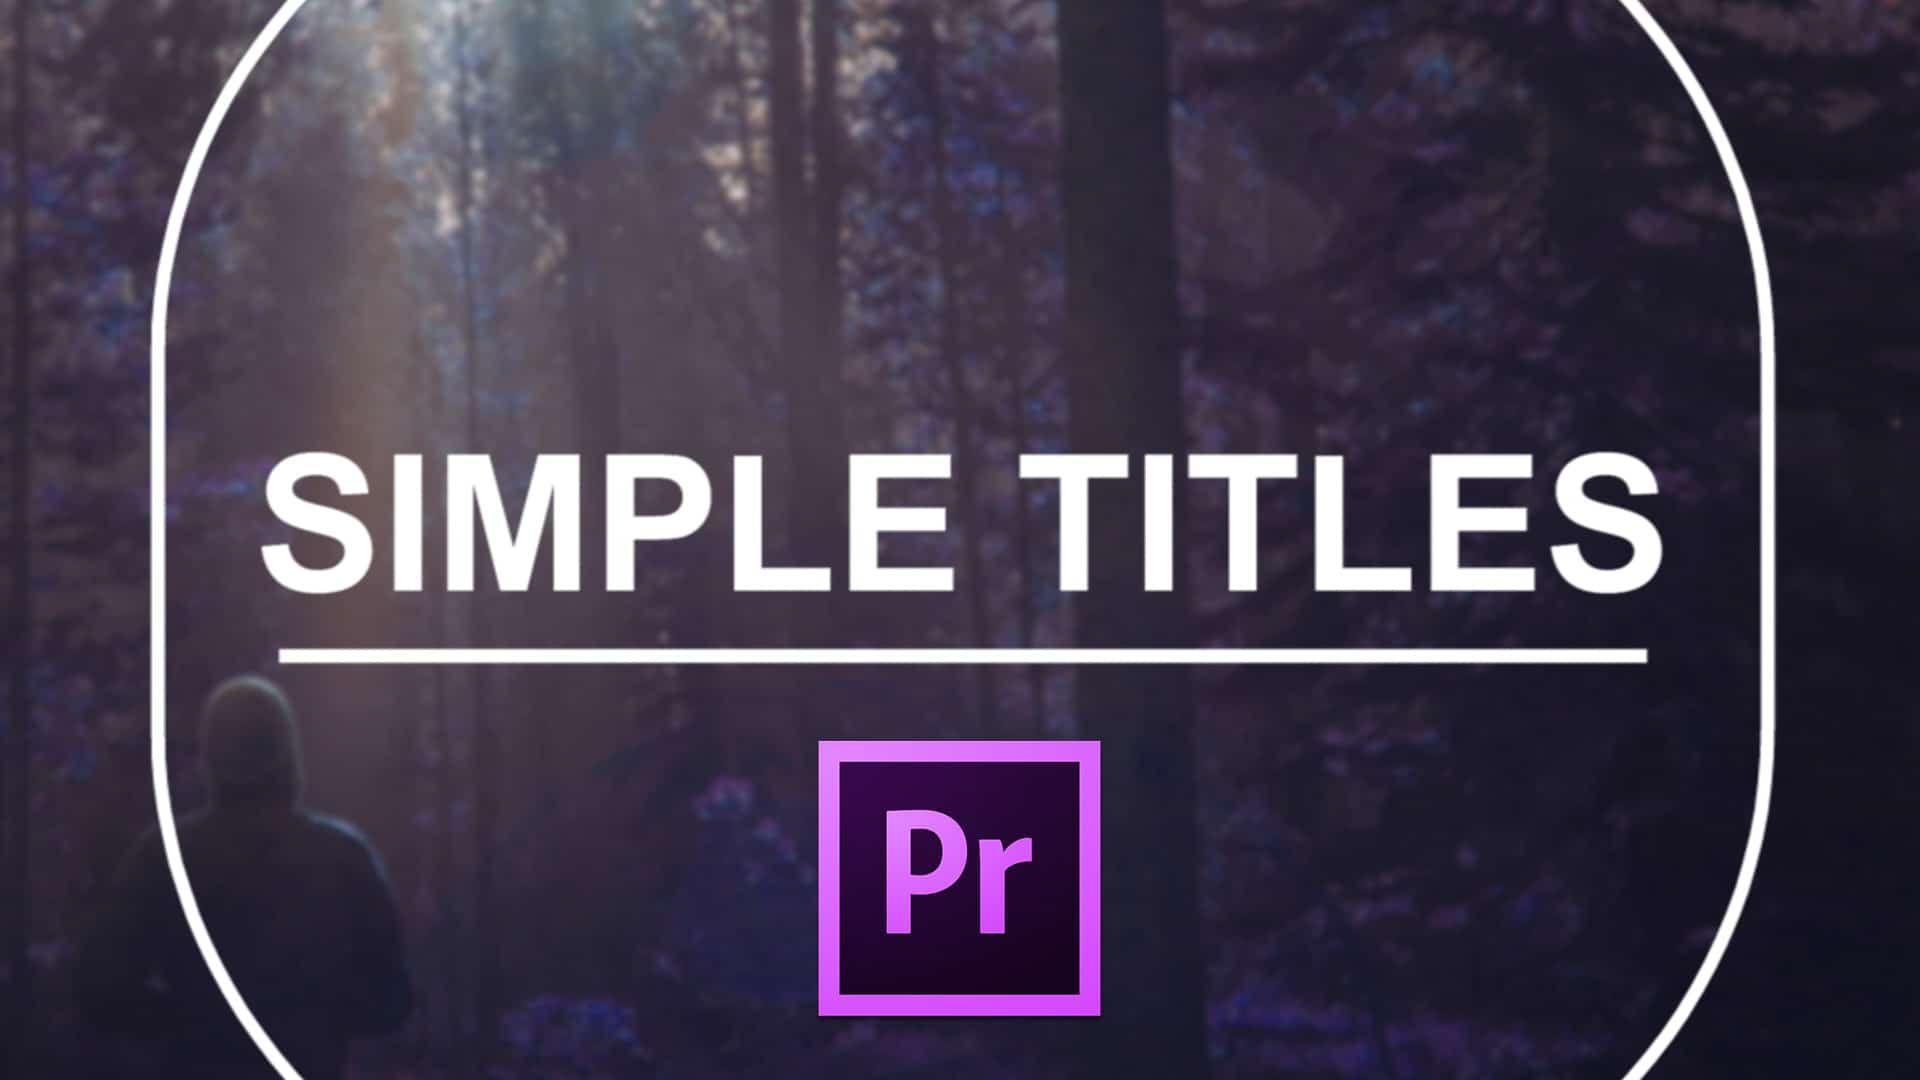 Simple Titles Bundles 10 Free Title Templates For Premiere Pro The